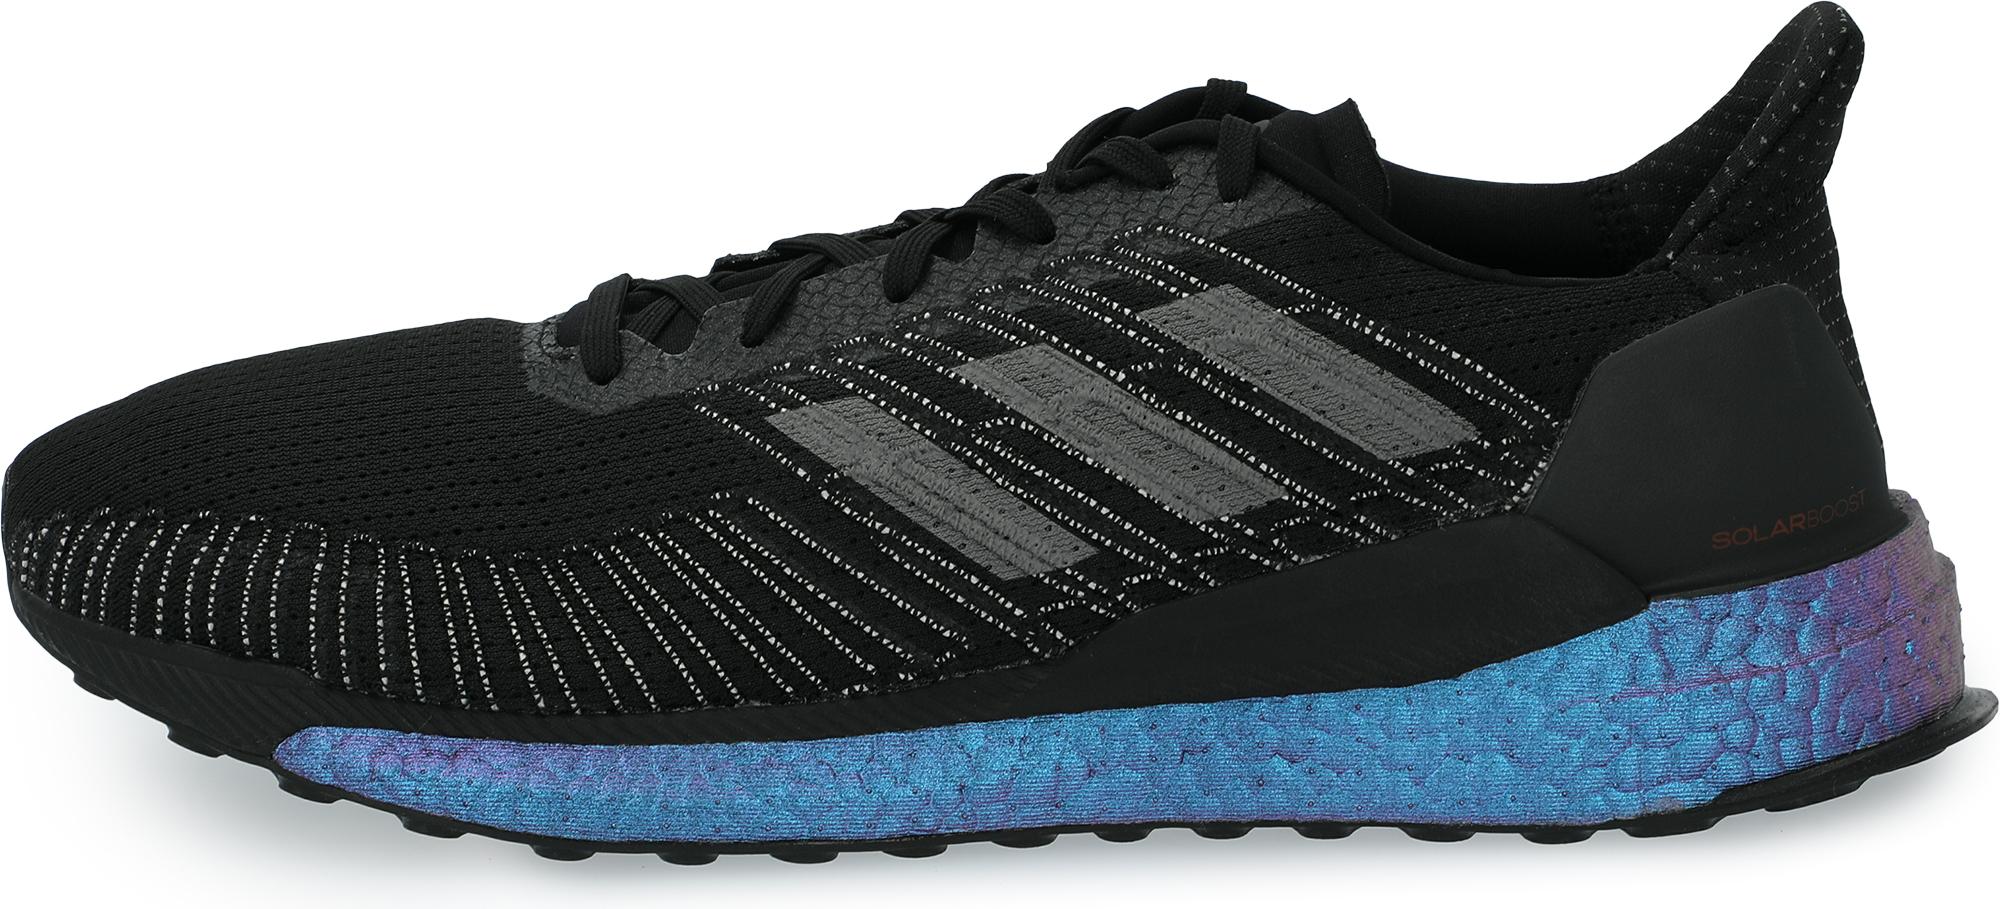 Adidas Кроссовки мужские Adidas Solar Boost 19, размер 40.5 баскетбольные кроссовки adidas rose boost rose derrick